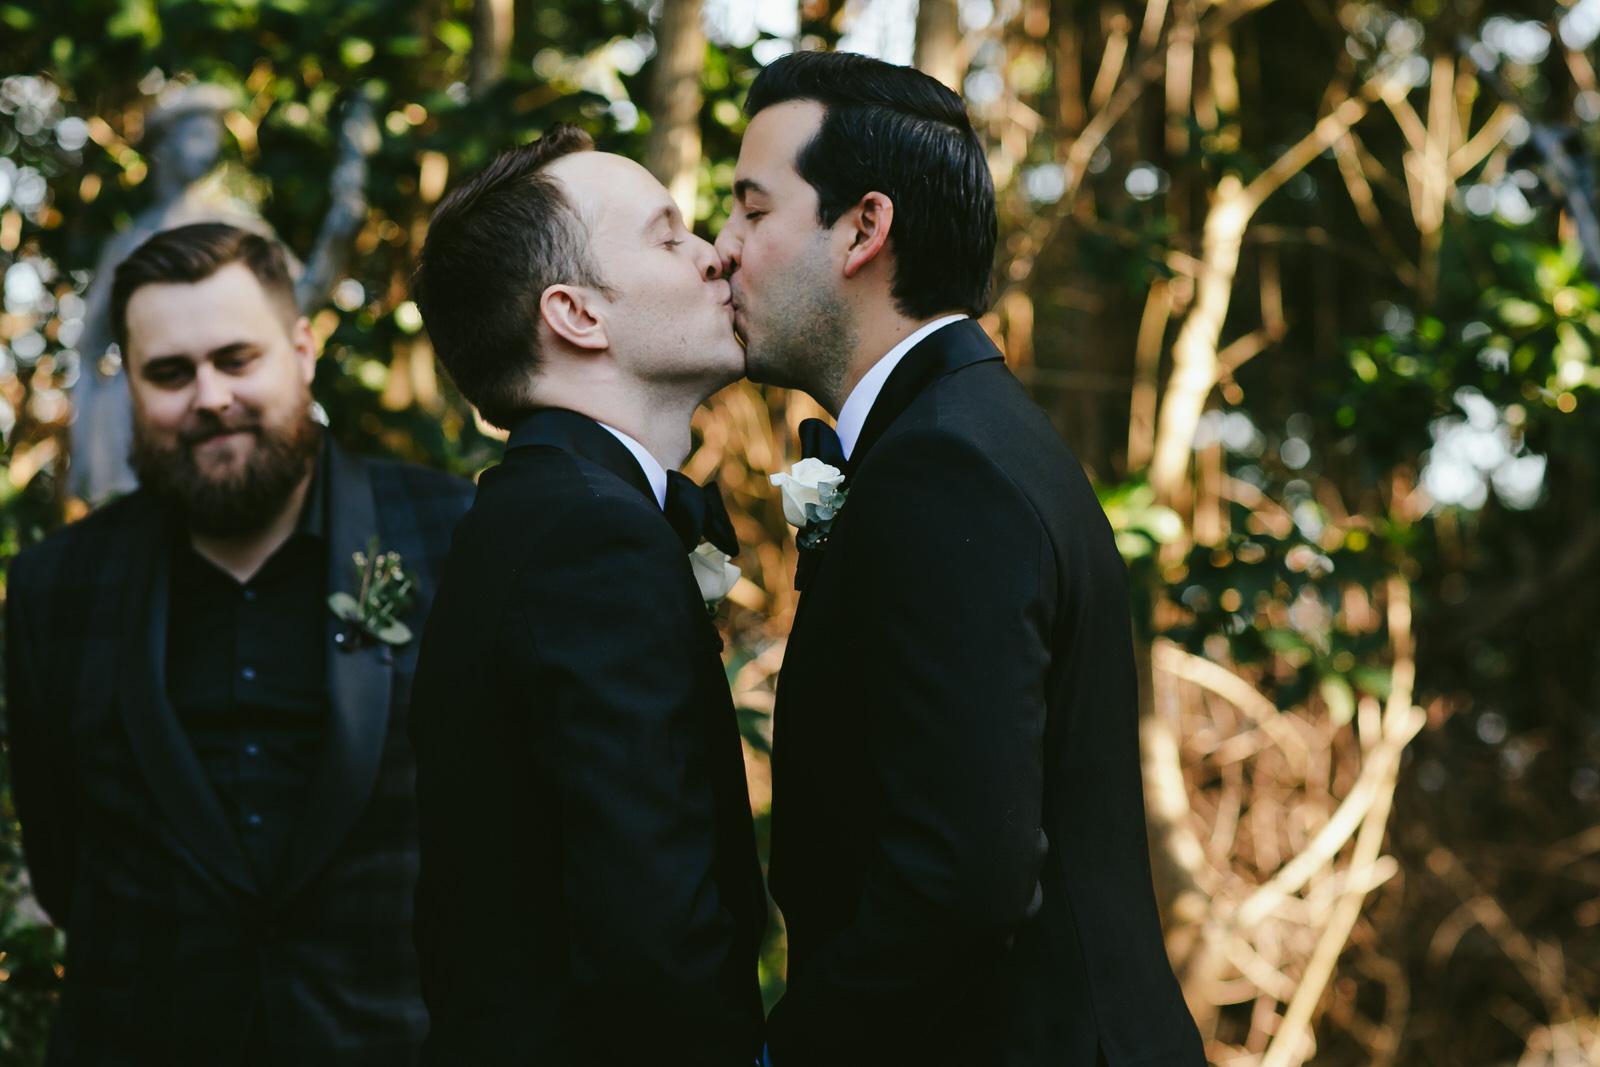 vizcaya_elopement_intimate_wedding_ceremony-46.jpg